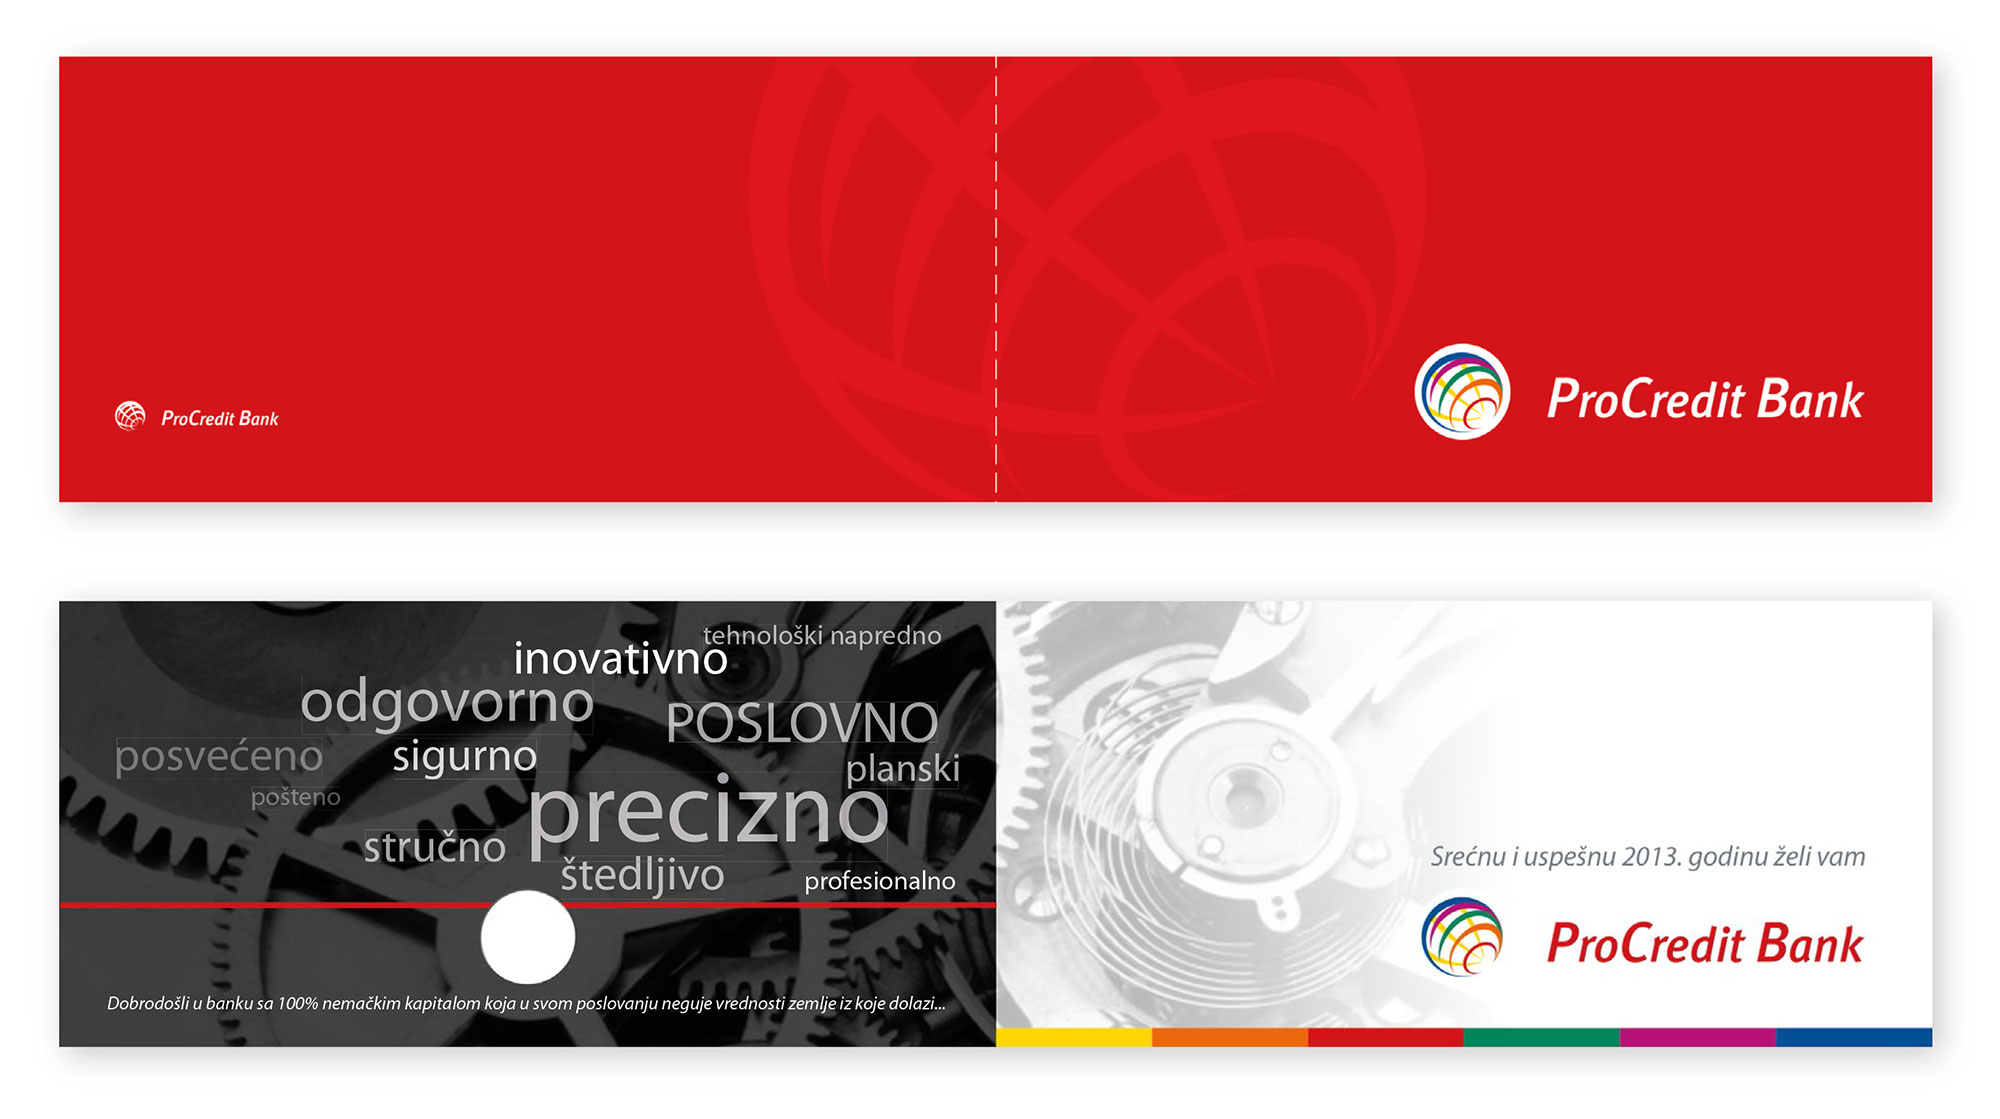 procreditbank promo materijal 1